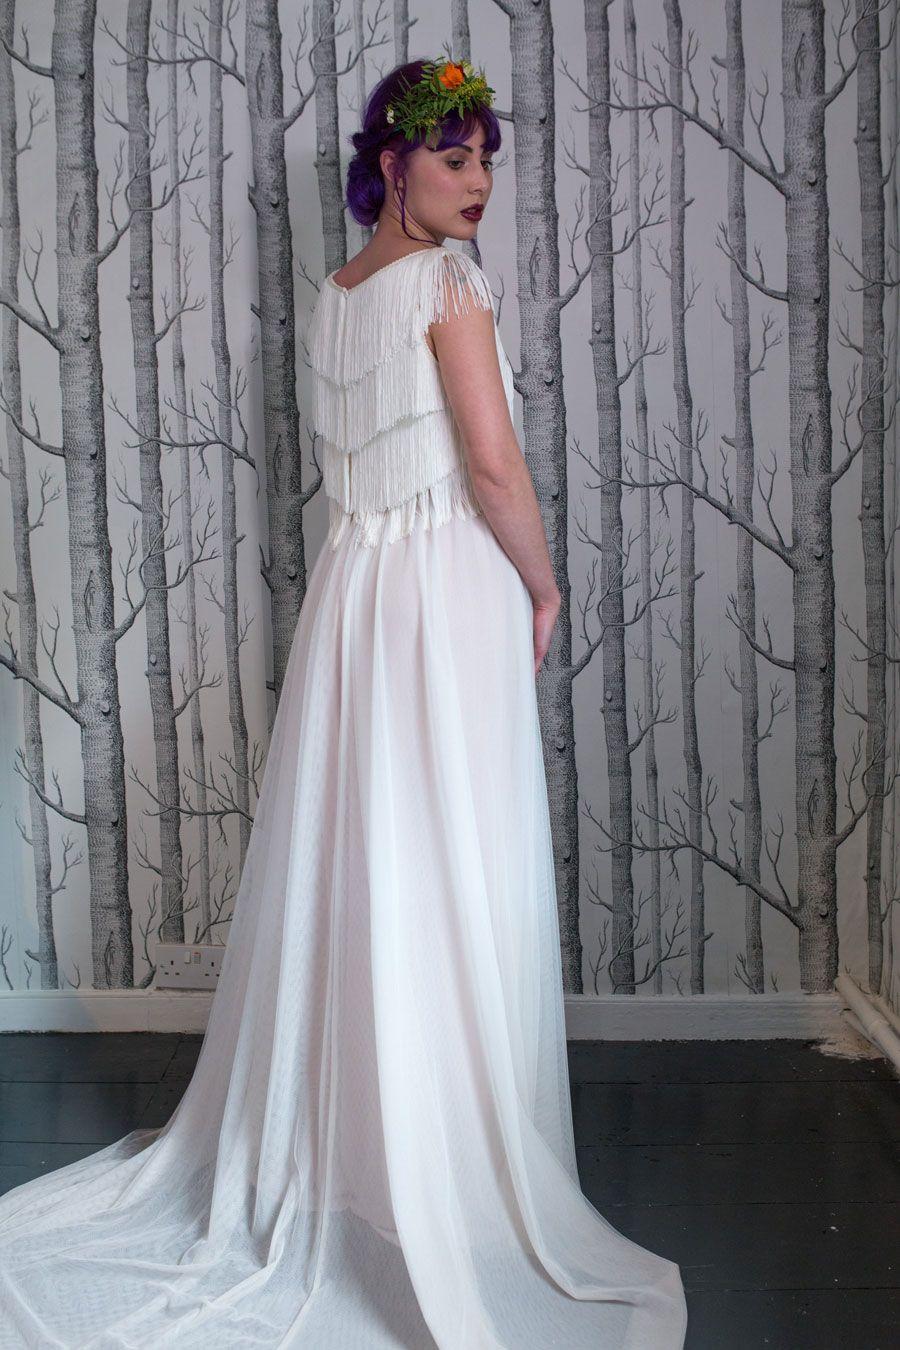 Non traditional wedding dress  Colourful u Quirky Wedding Dresses For NonTraditional Brides Lucy